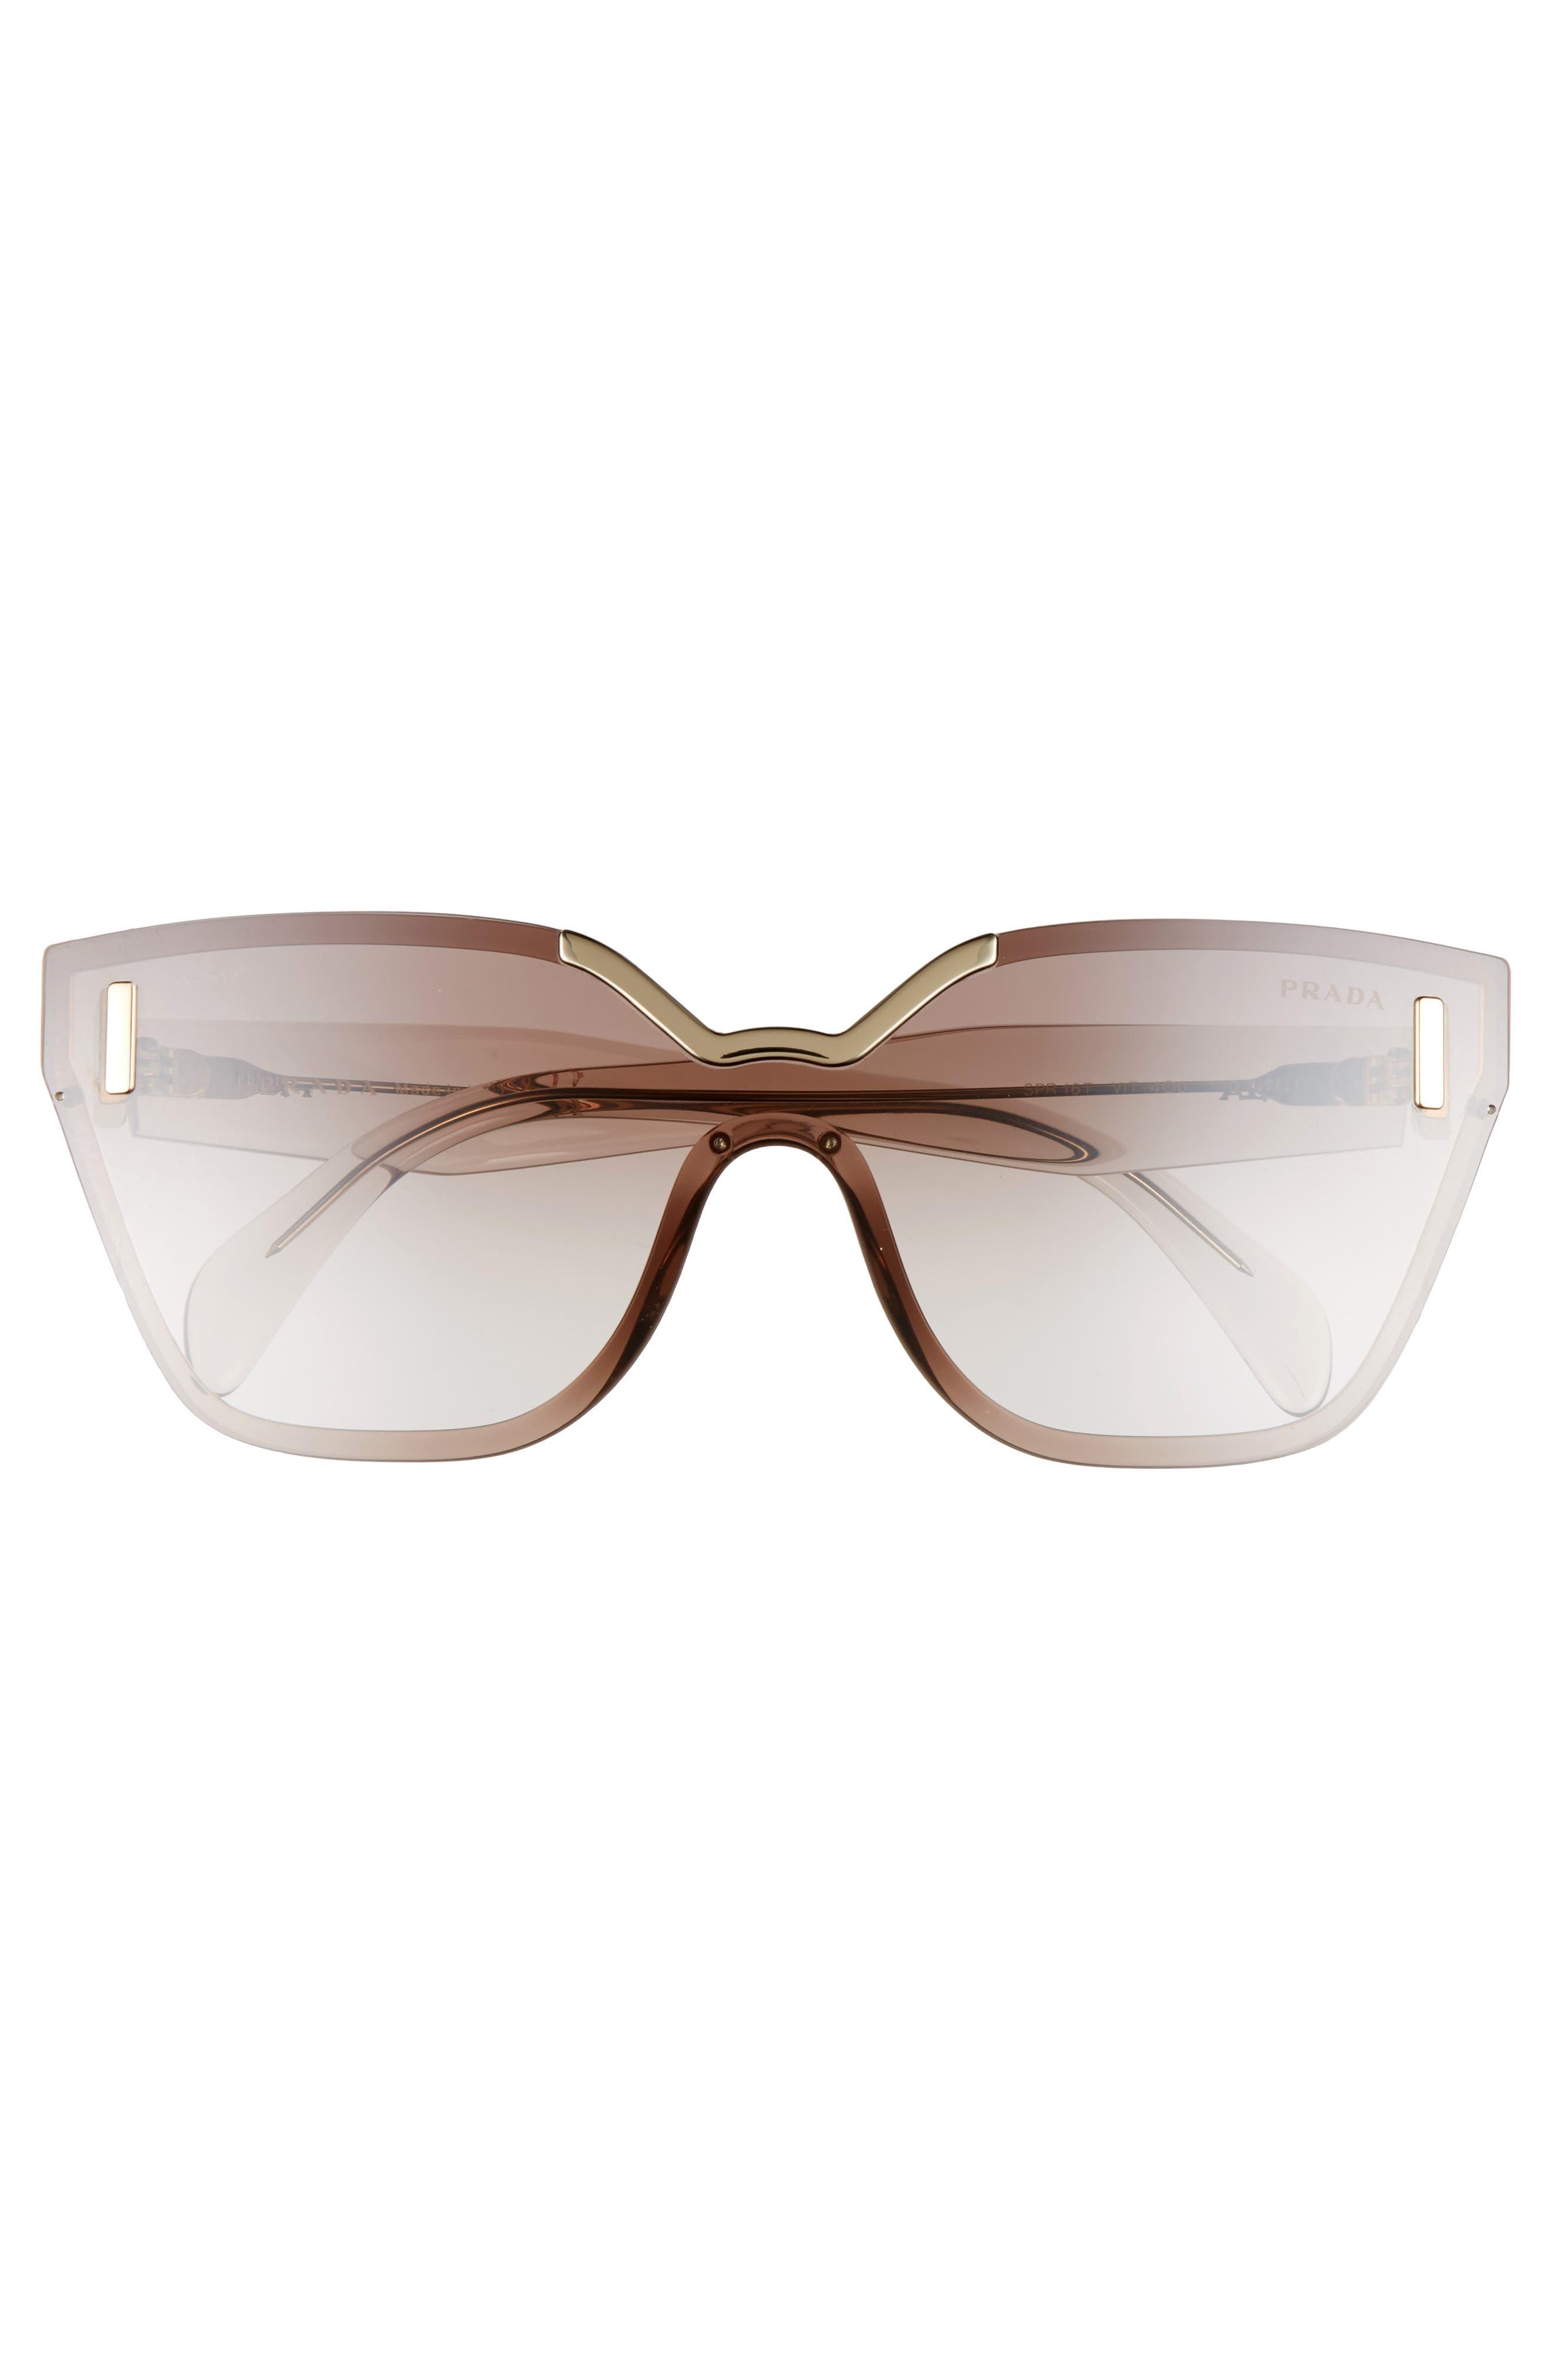 61mm Mirrored Shield Sunglasses,                             Alternate thumbnail 3, color,                             200